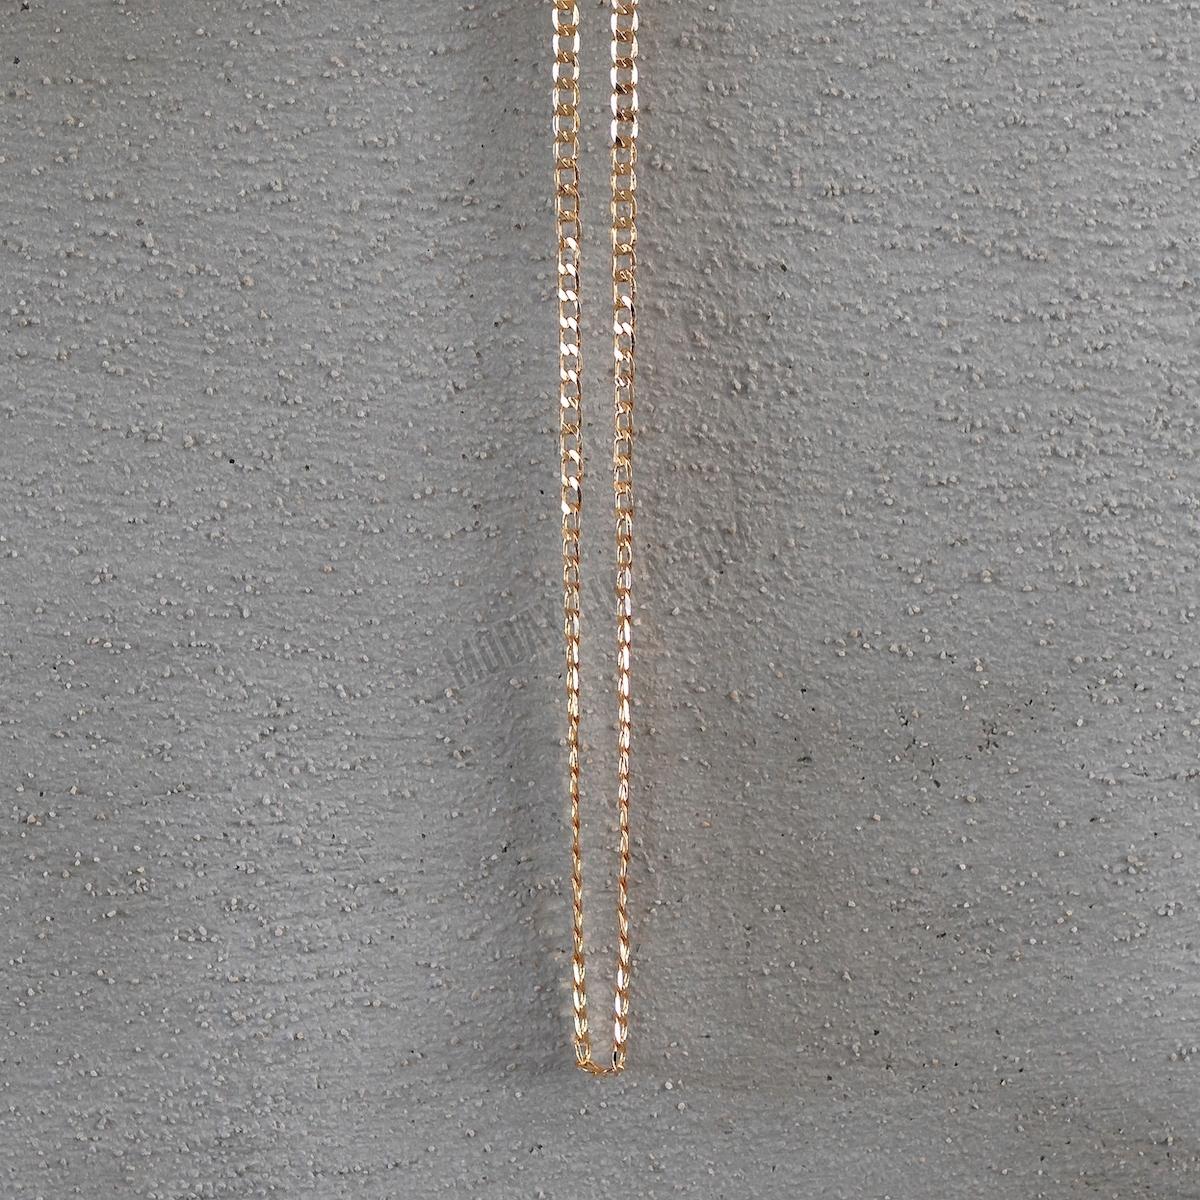 Gold Figaro Zincir Kolye